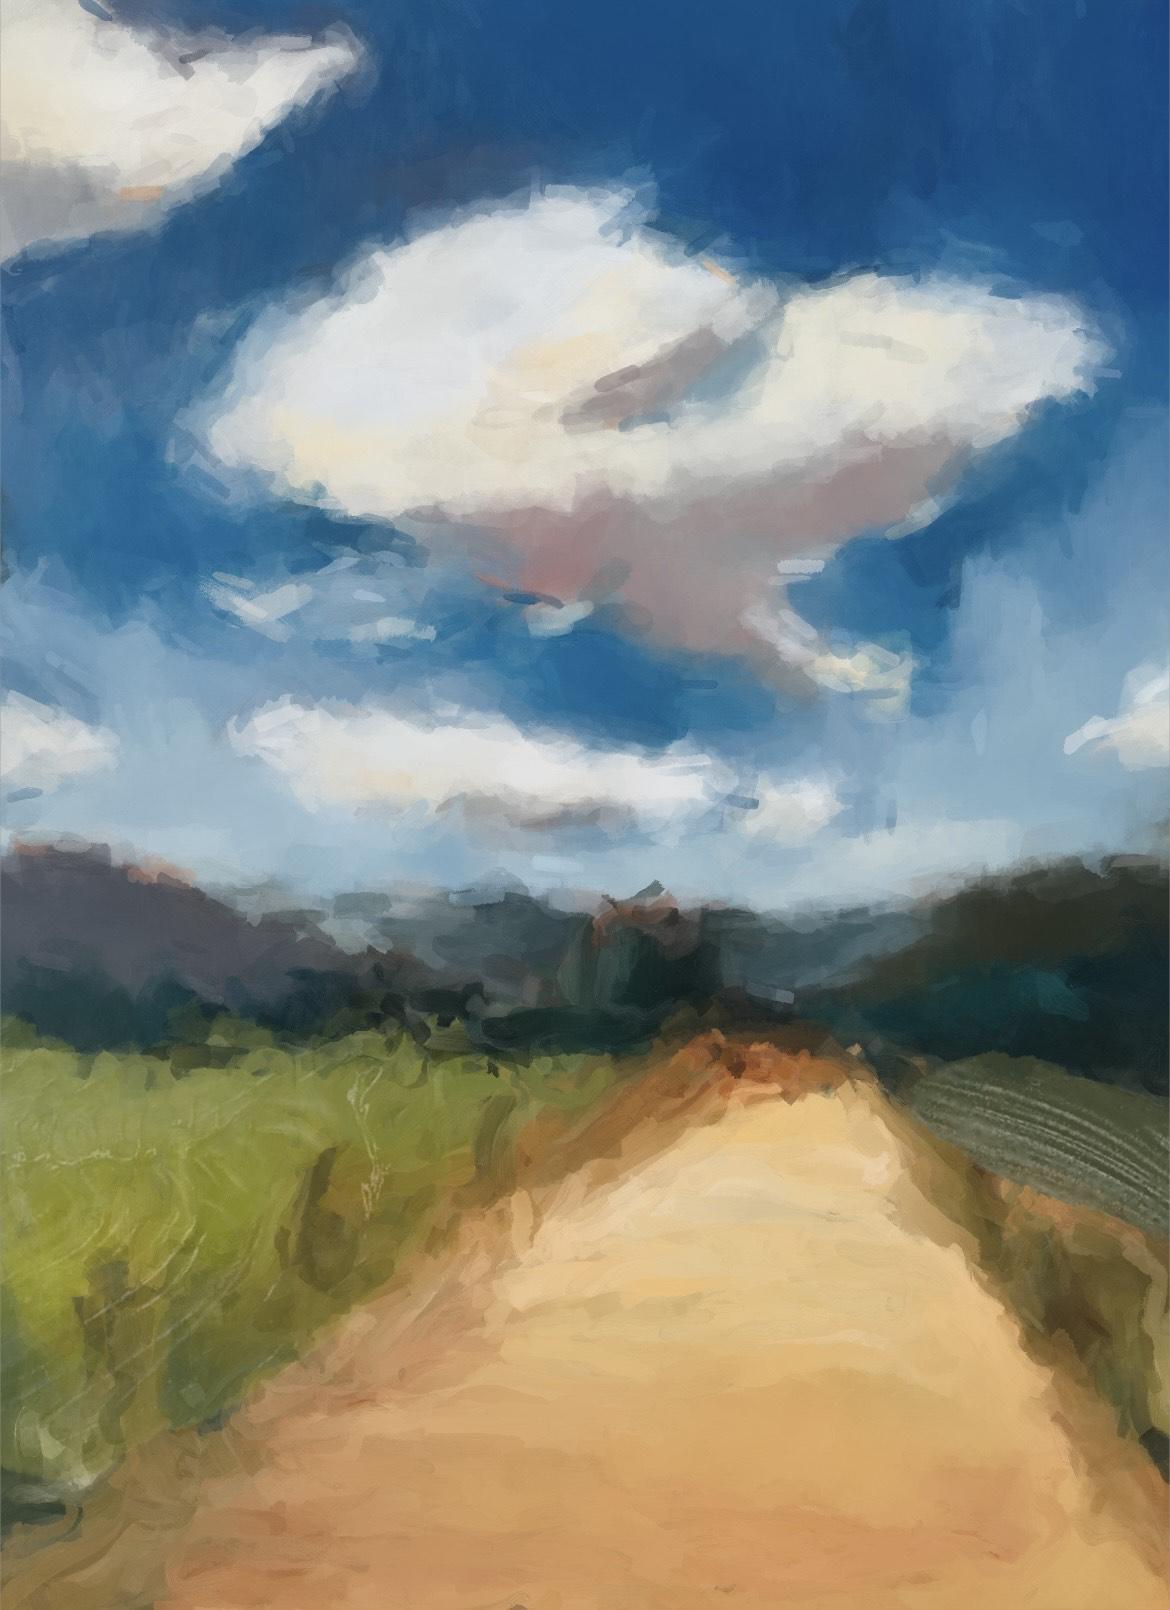 Summer Landscape in Watercolor